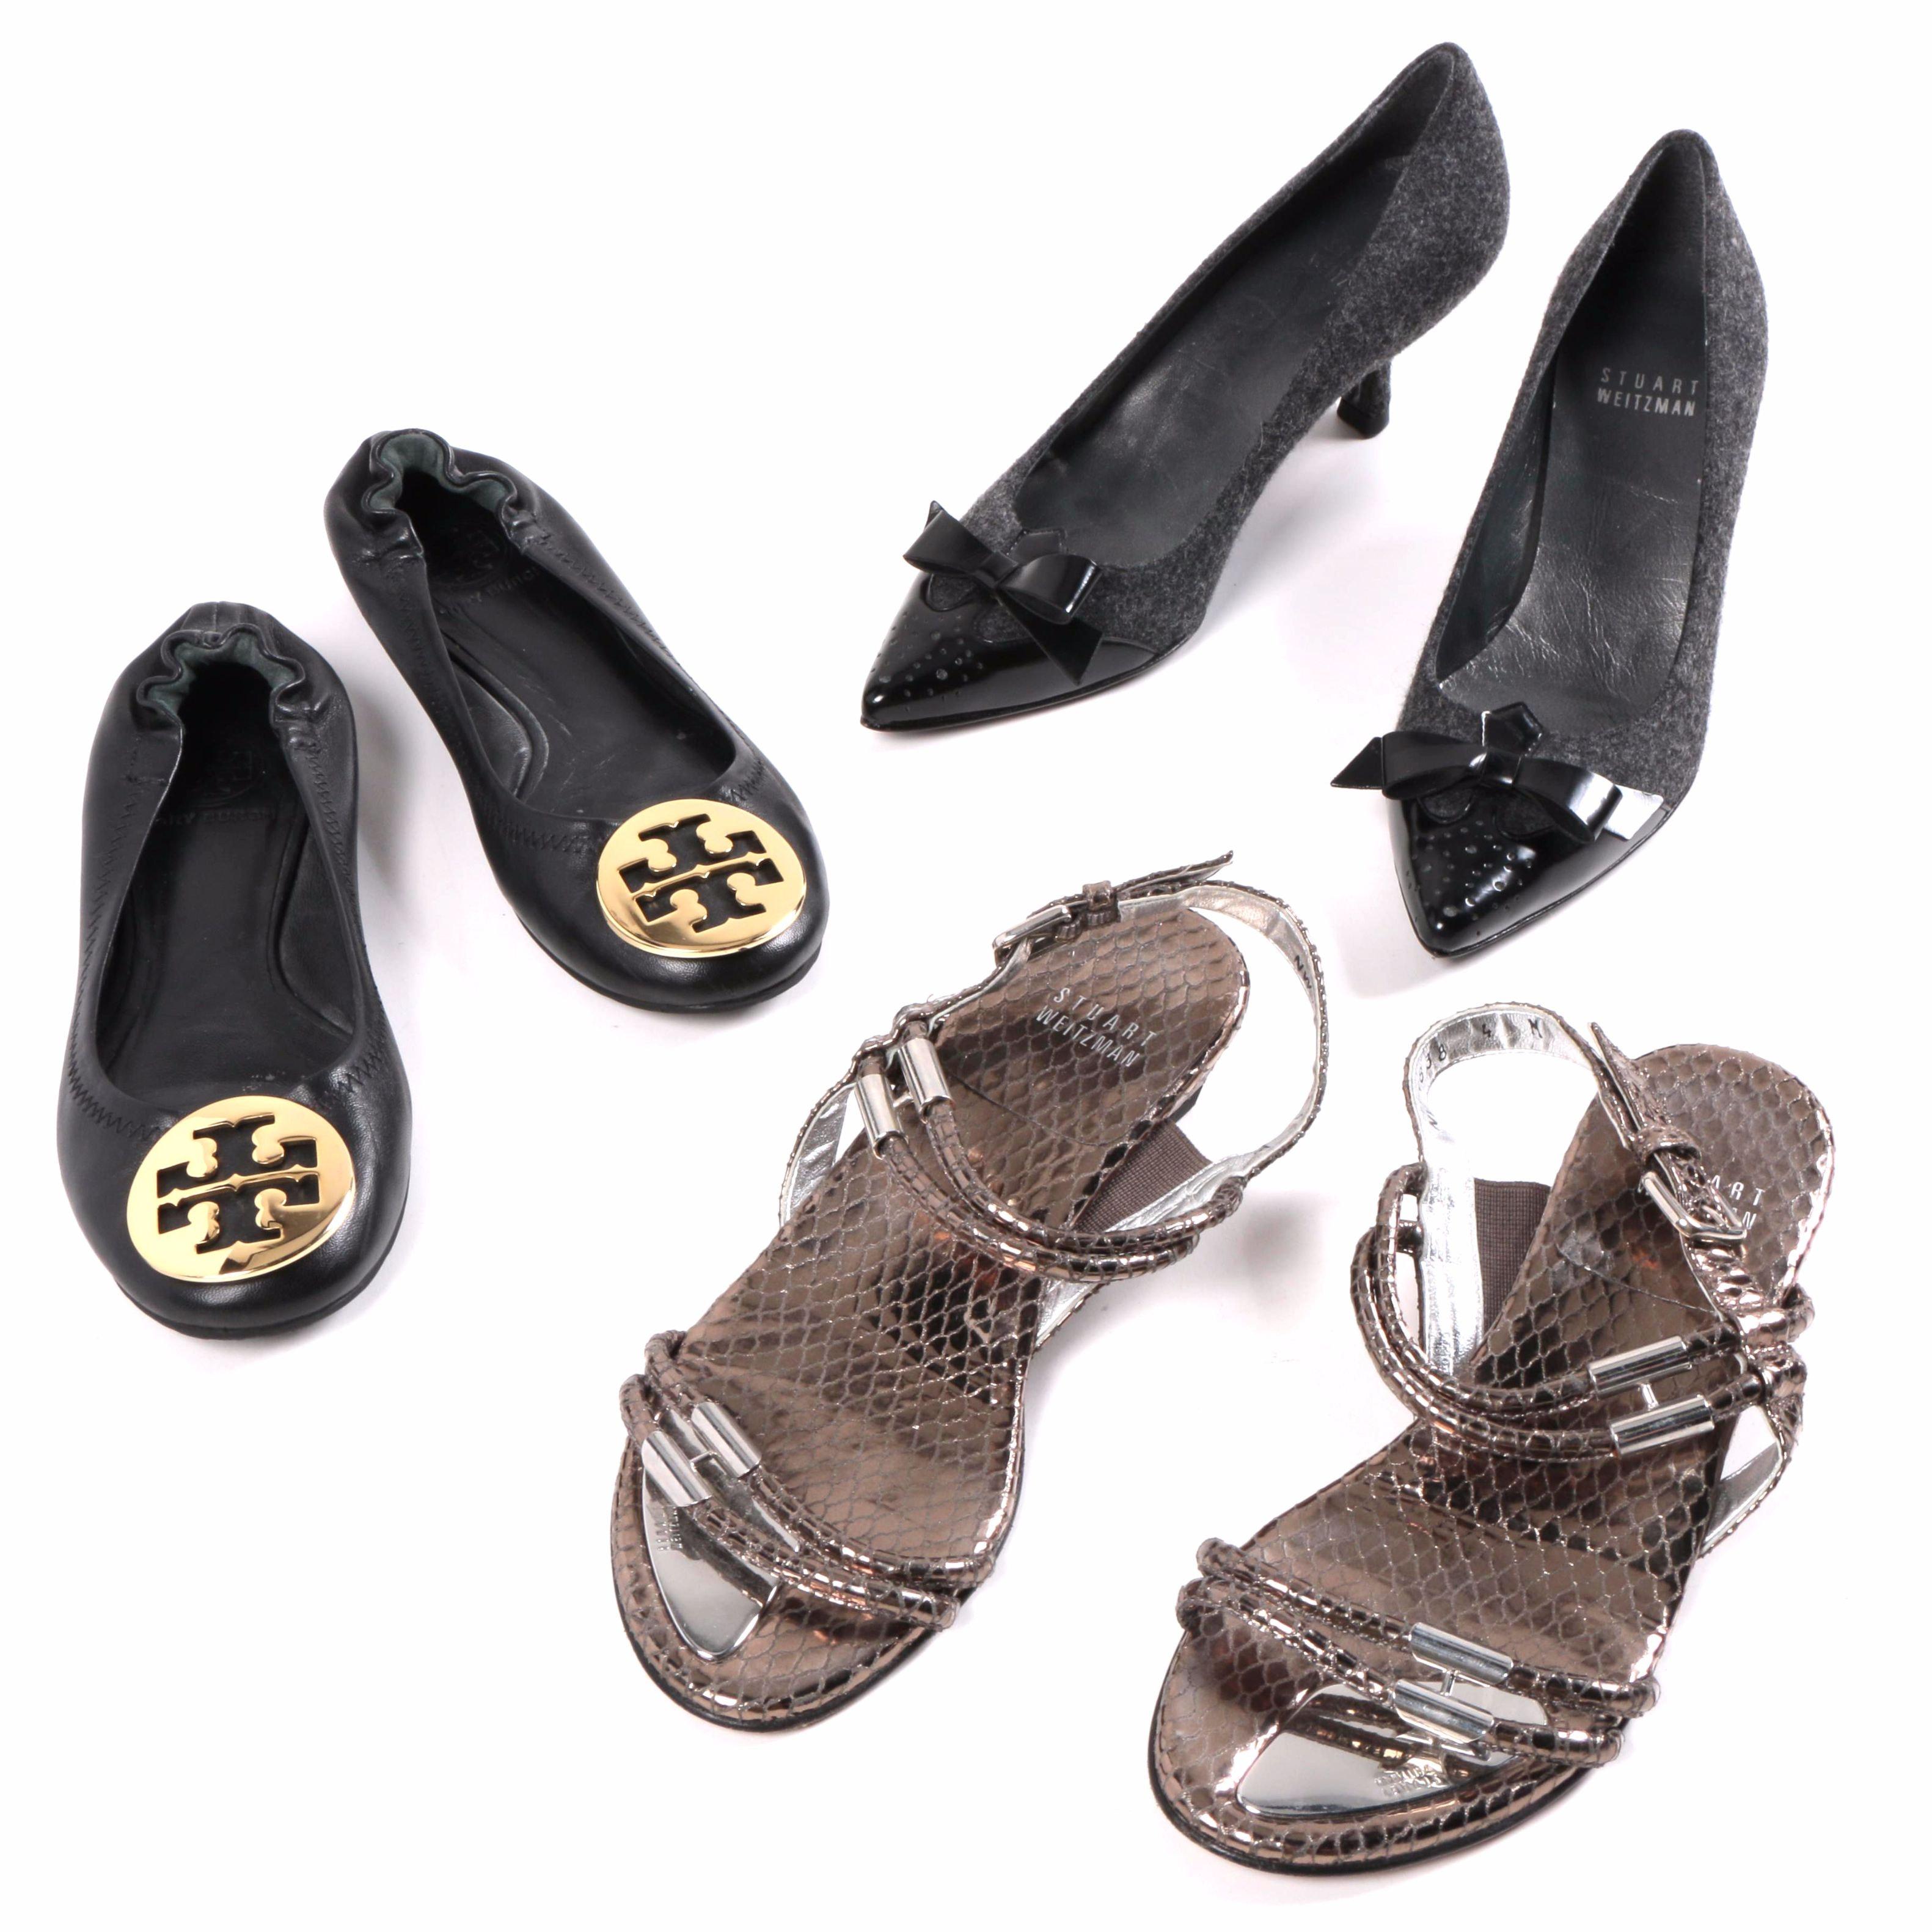 Women's Shoes Including Tory Burch